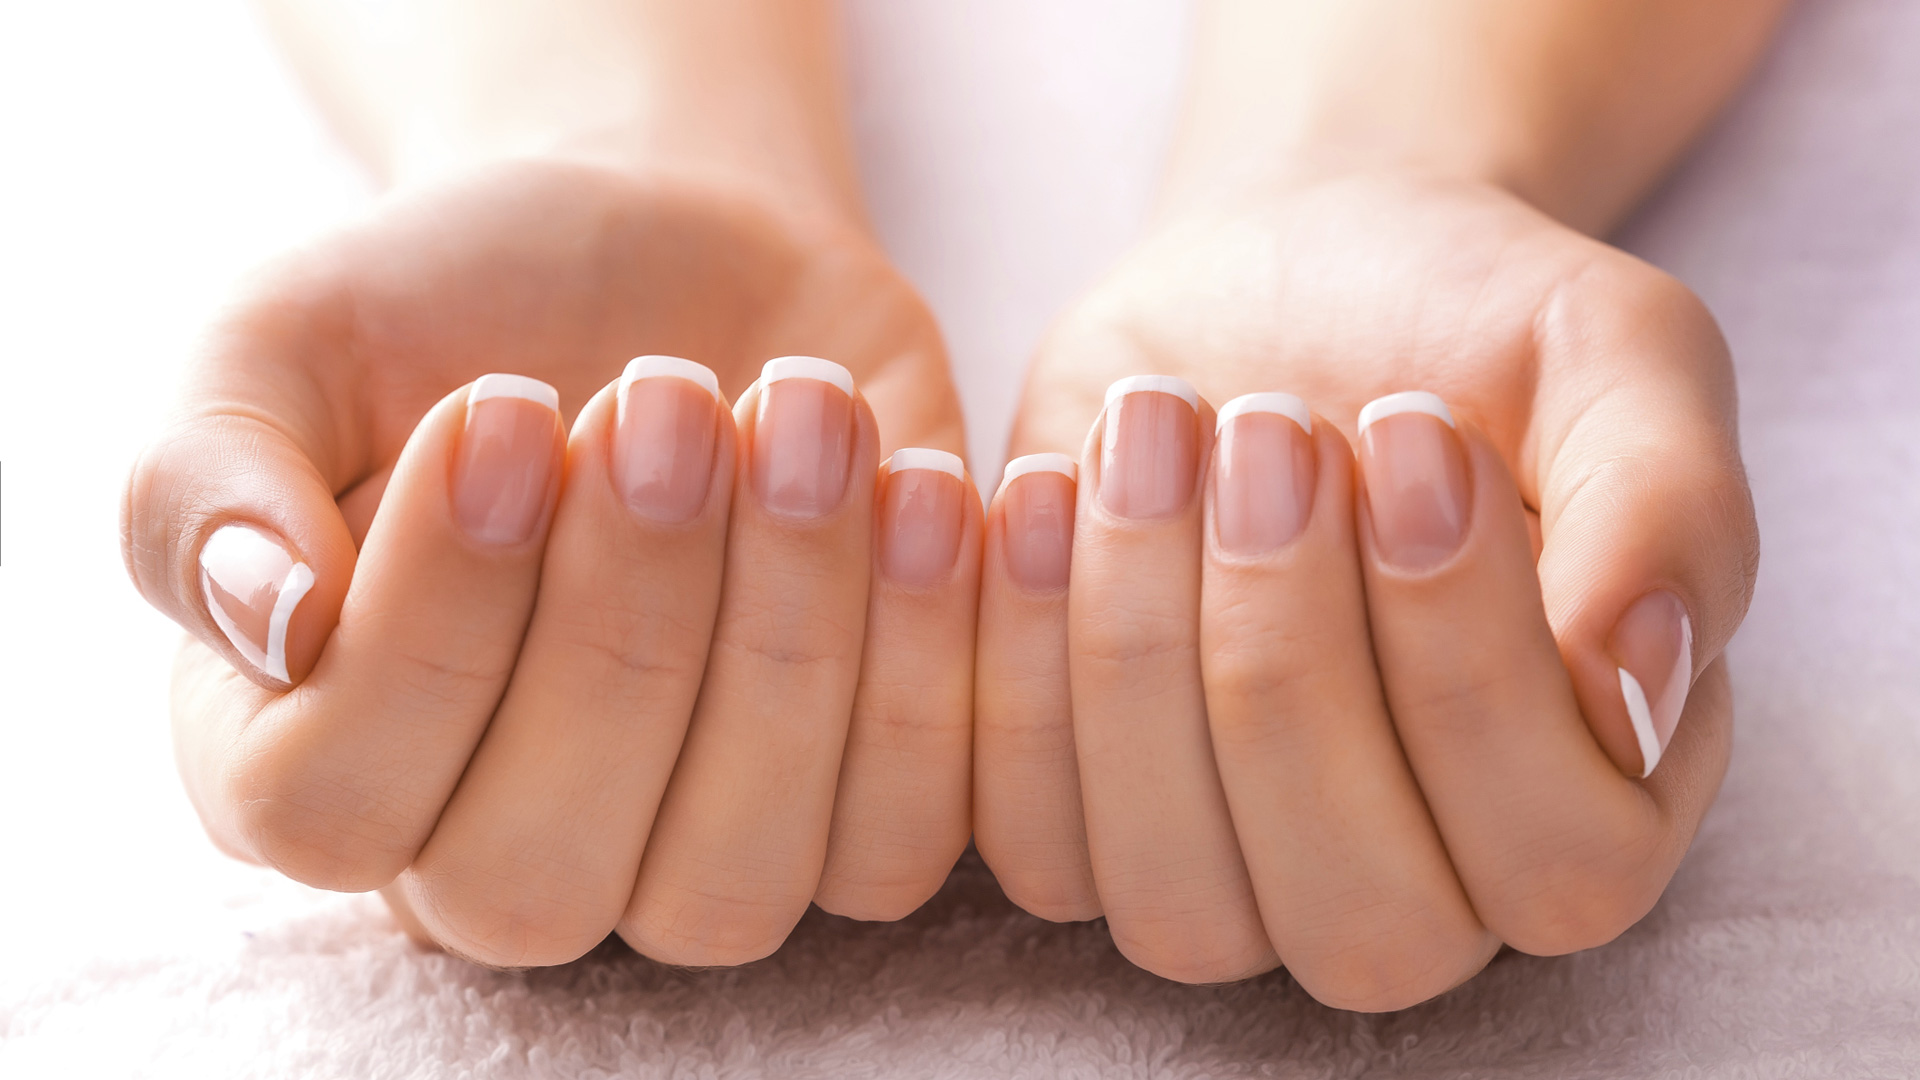 Healthy life - healthy nails